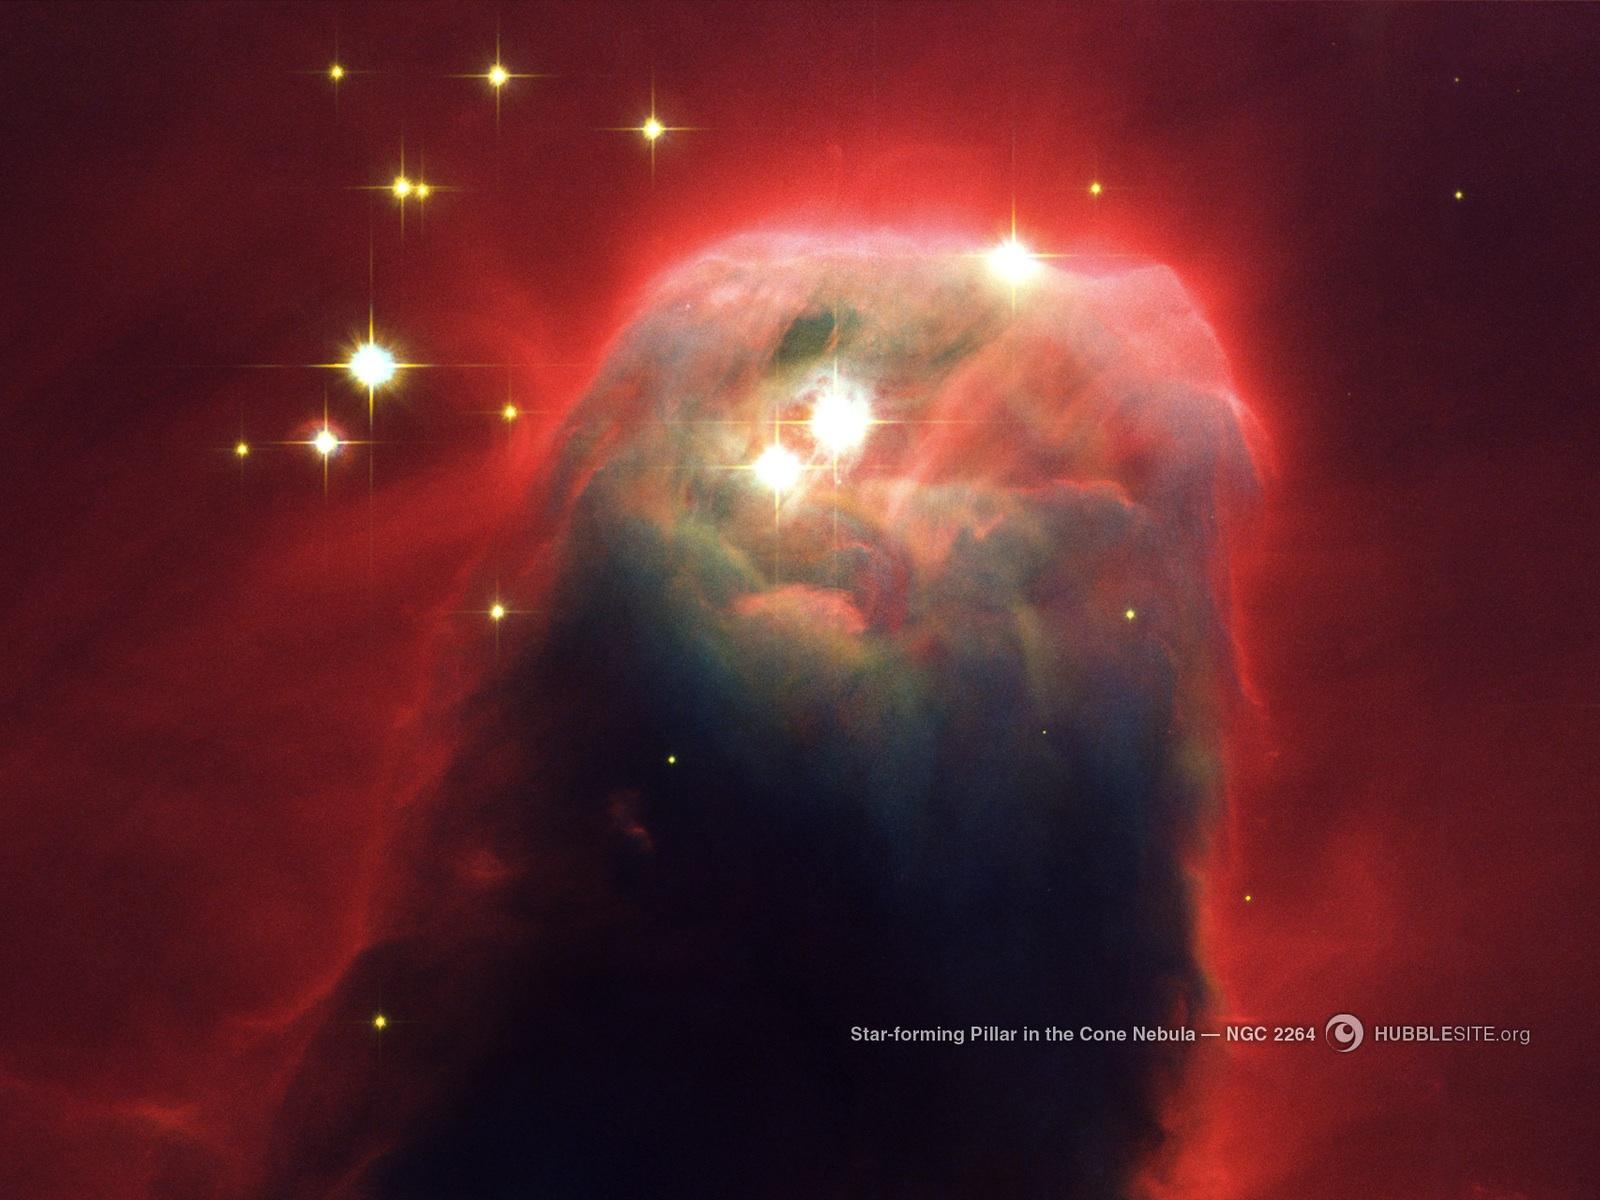 The Cone Nebula (NGC 2264)